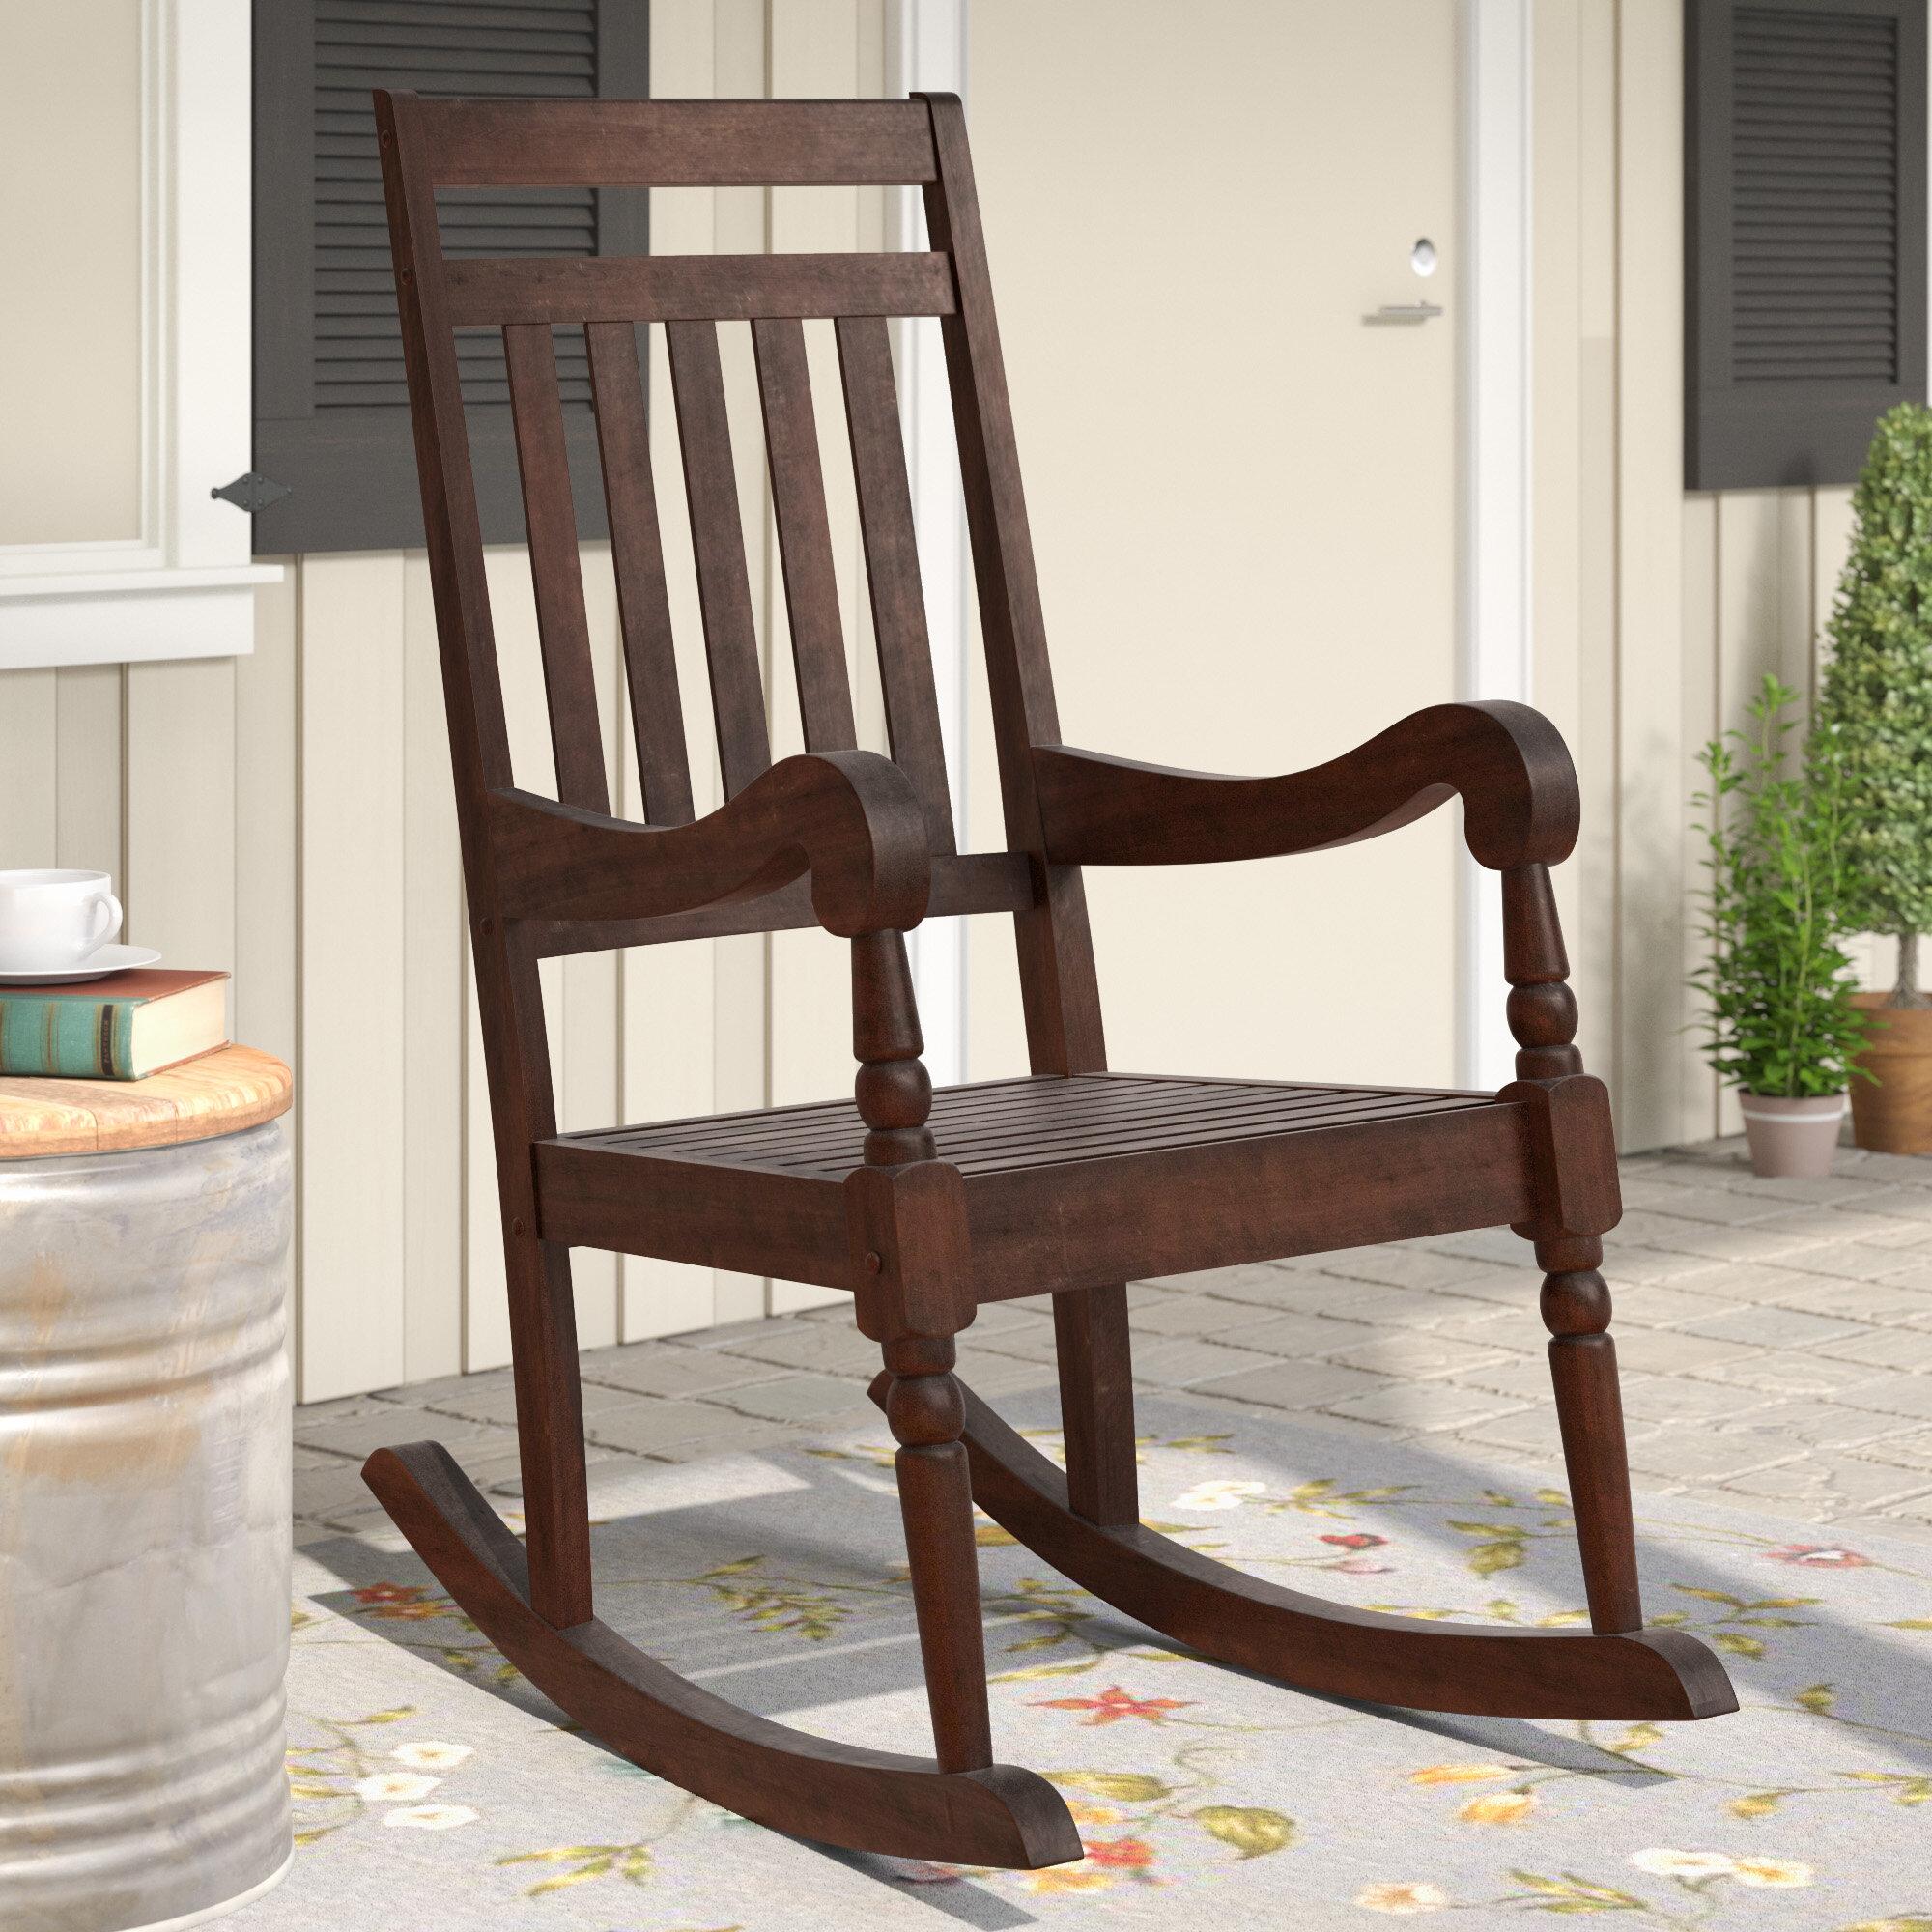 Laurel Foundry Modern Farmhouse Glen Ullin Modern Rocking Chair U0026 Reviews |  Wayfair